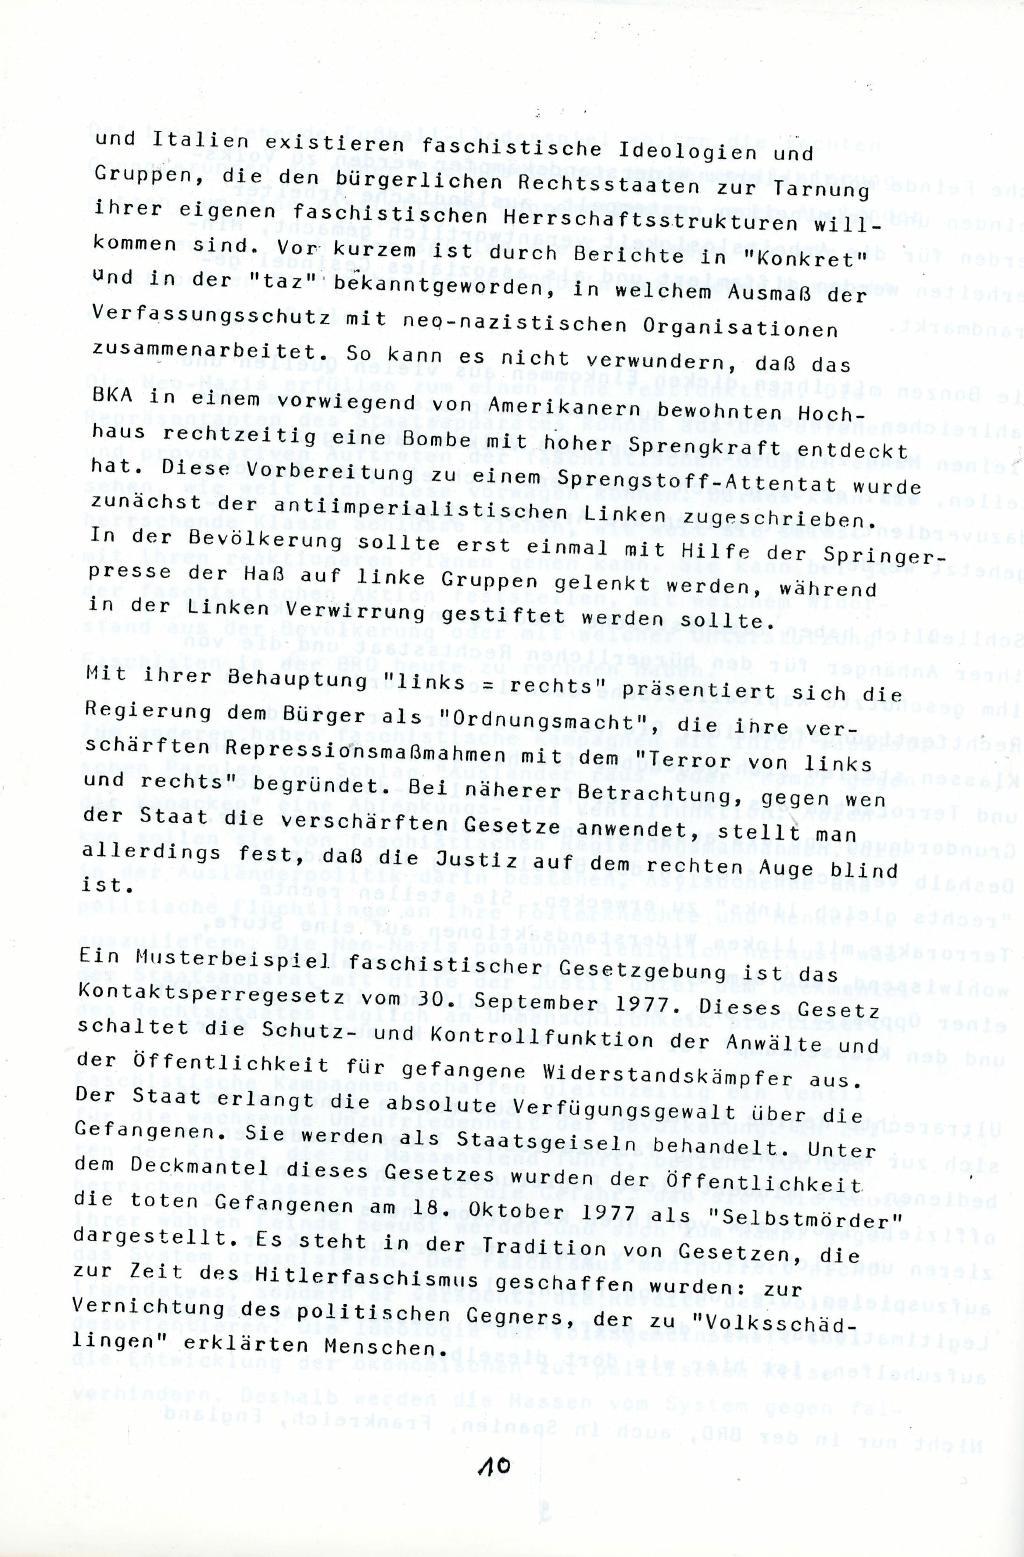 Berlin_1983_Autonome_Gruppen_Faschismus_im_Kapitalismus_10